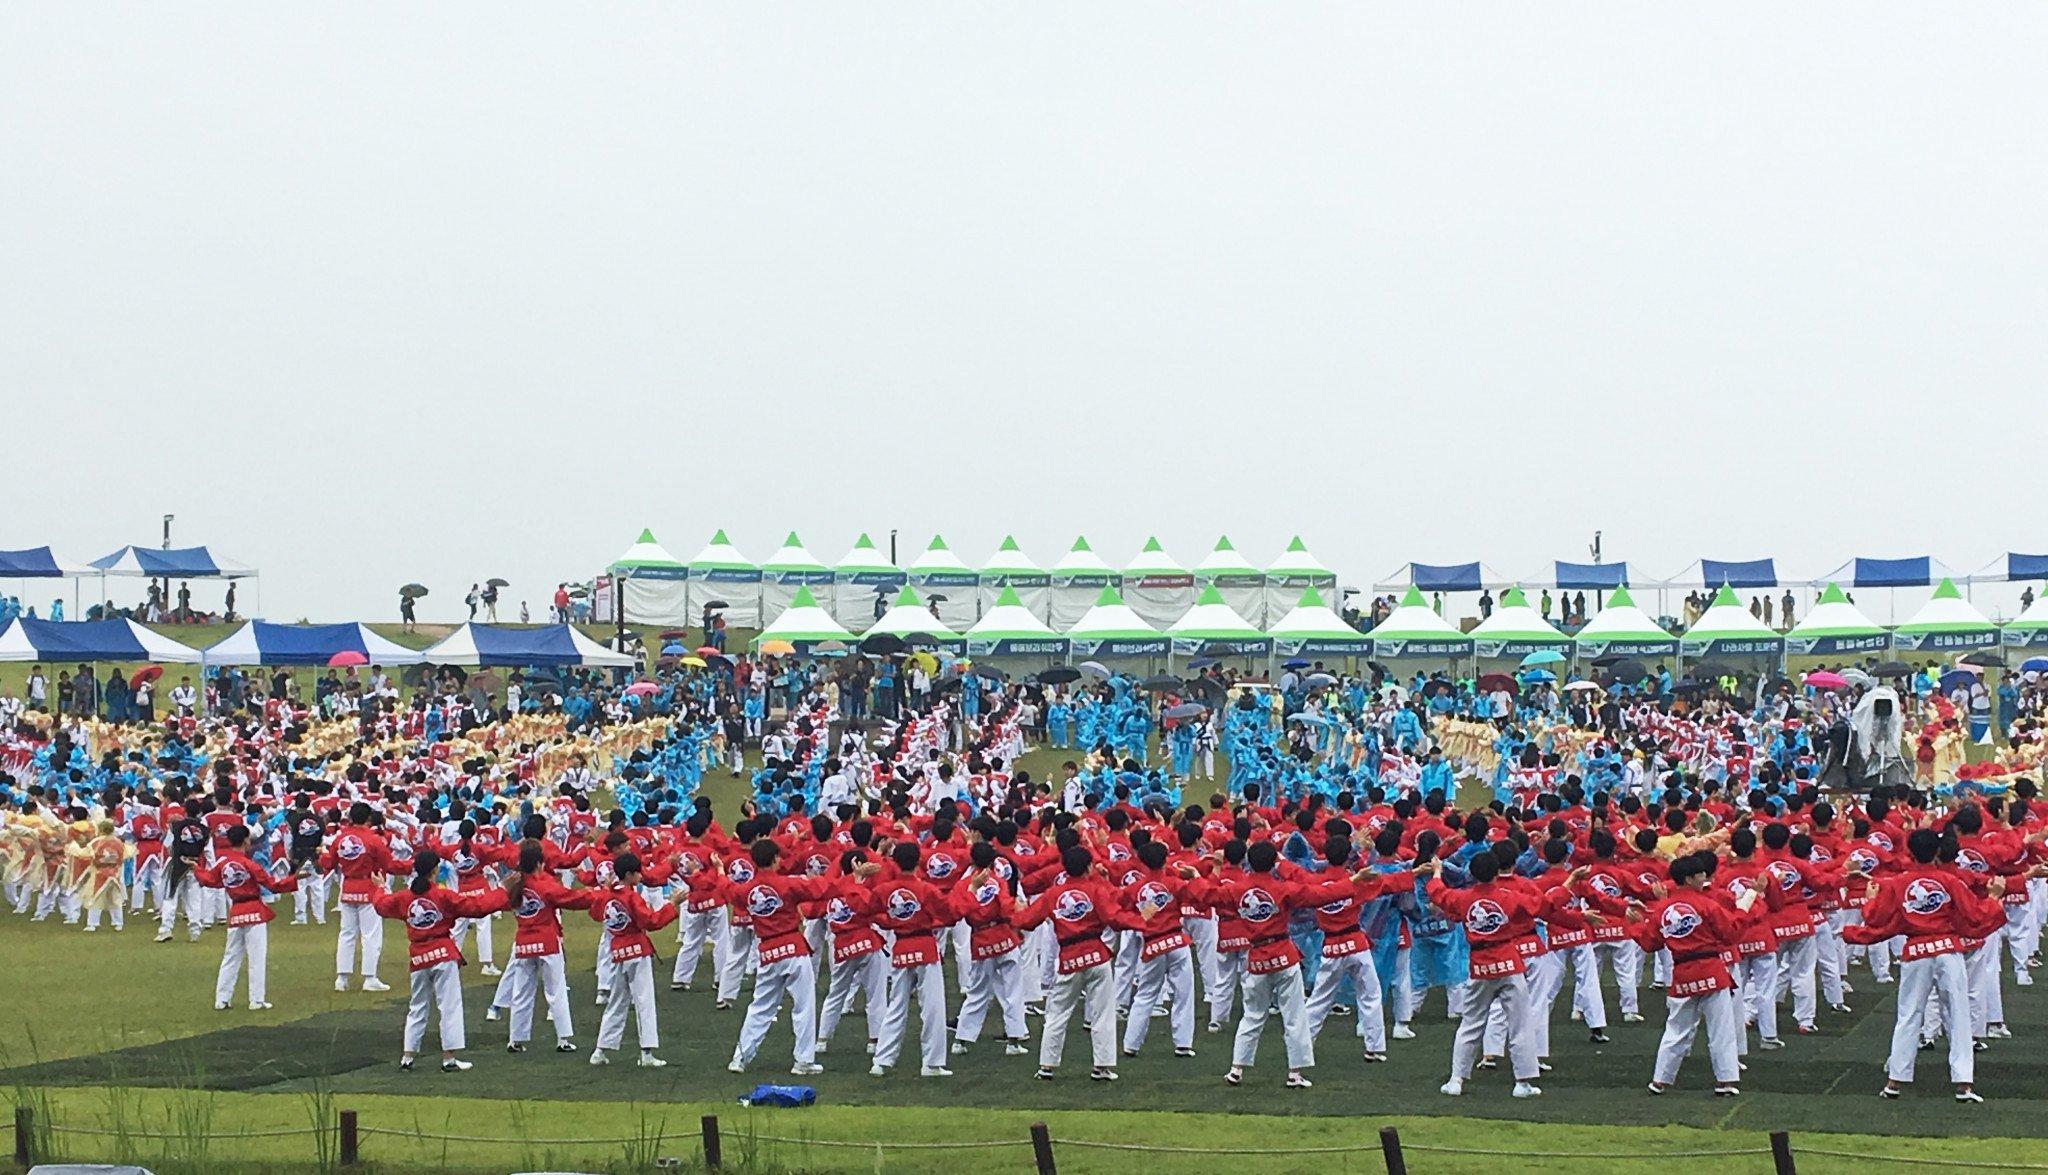 Taekwondo athletes perform flash mob at festival focused on world peace